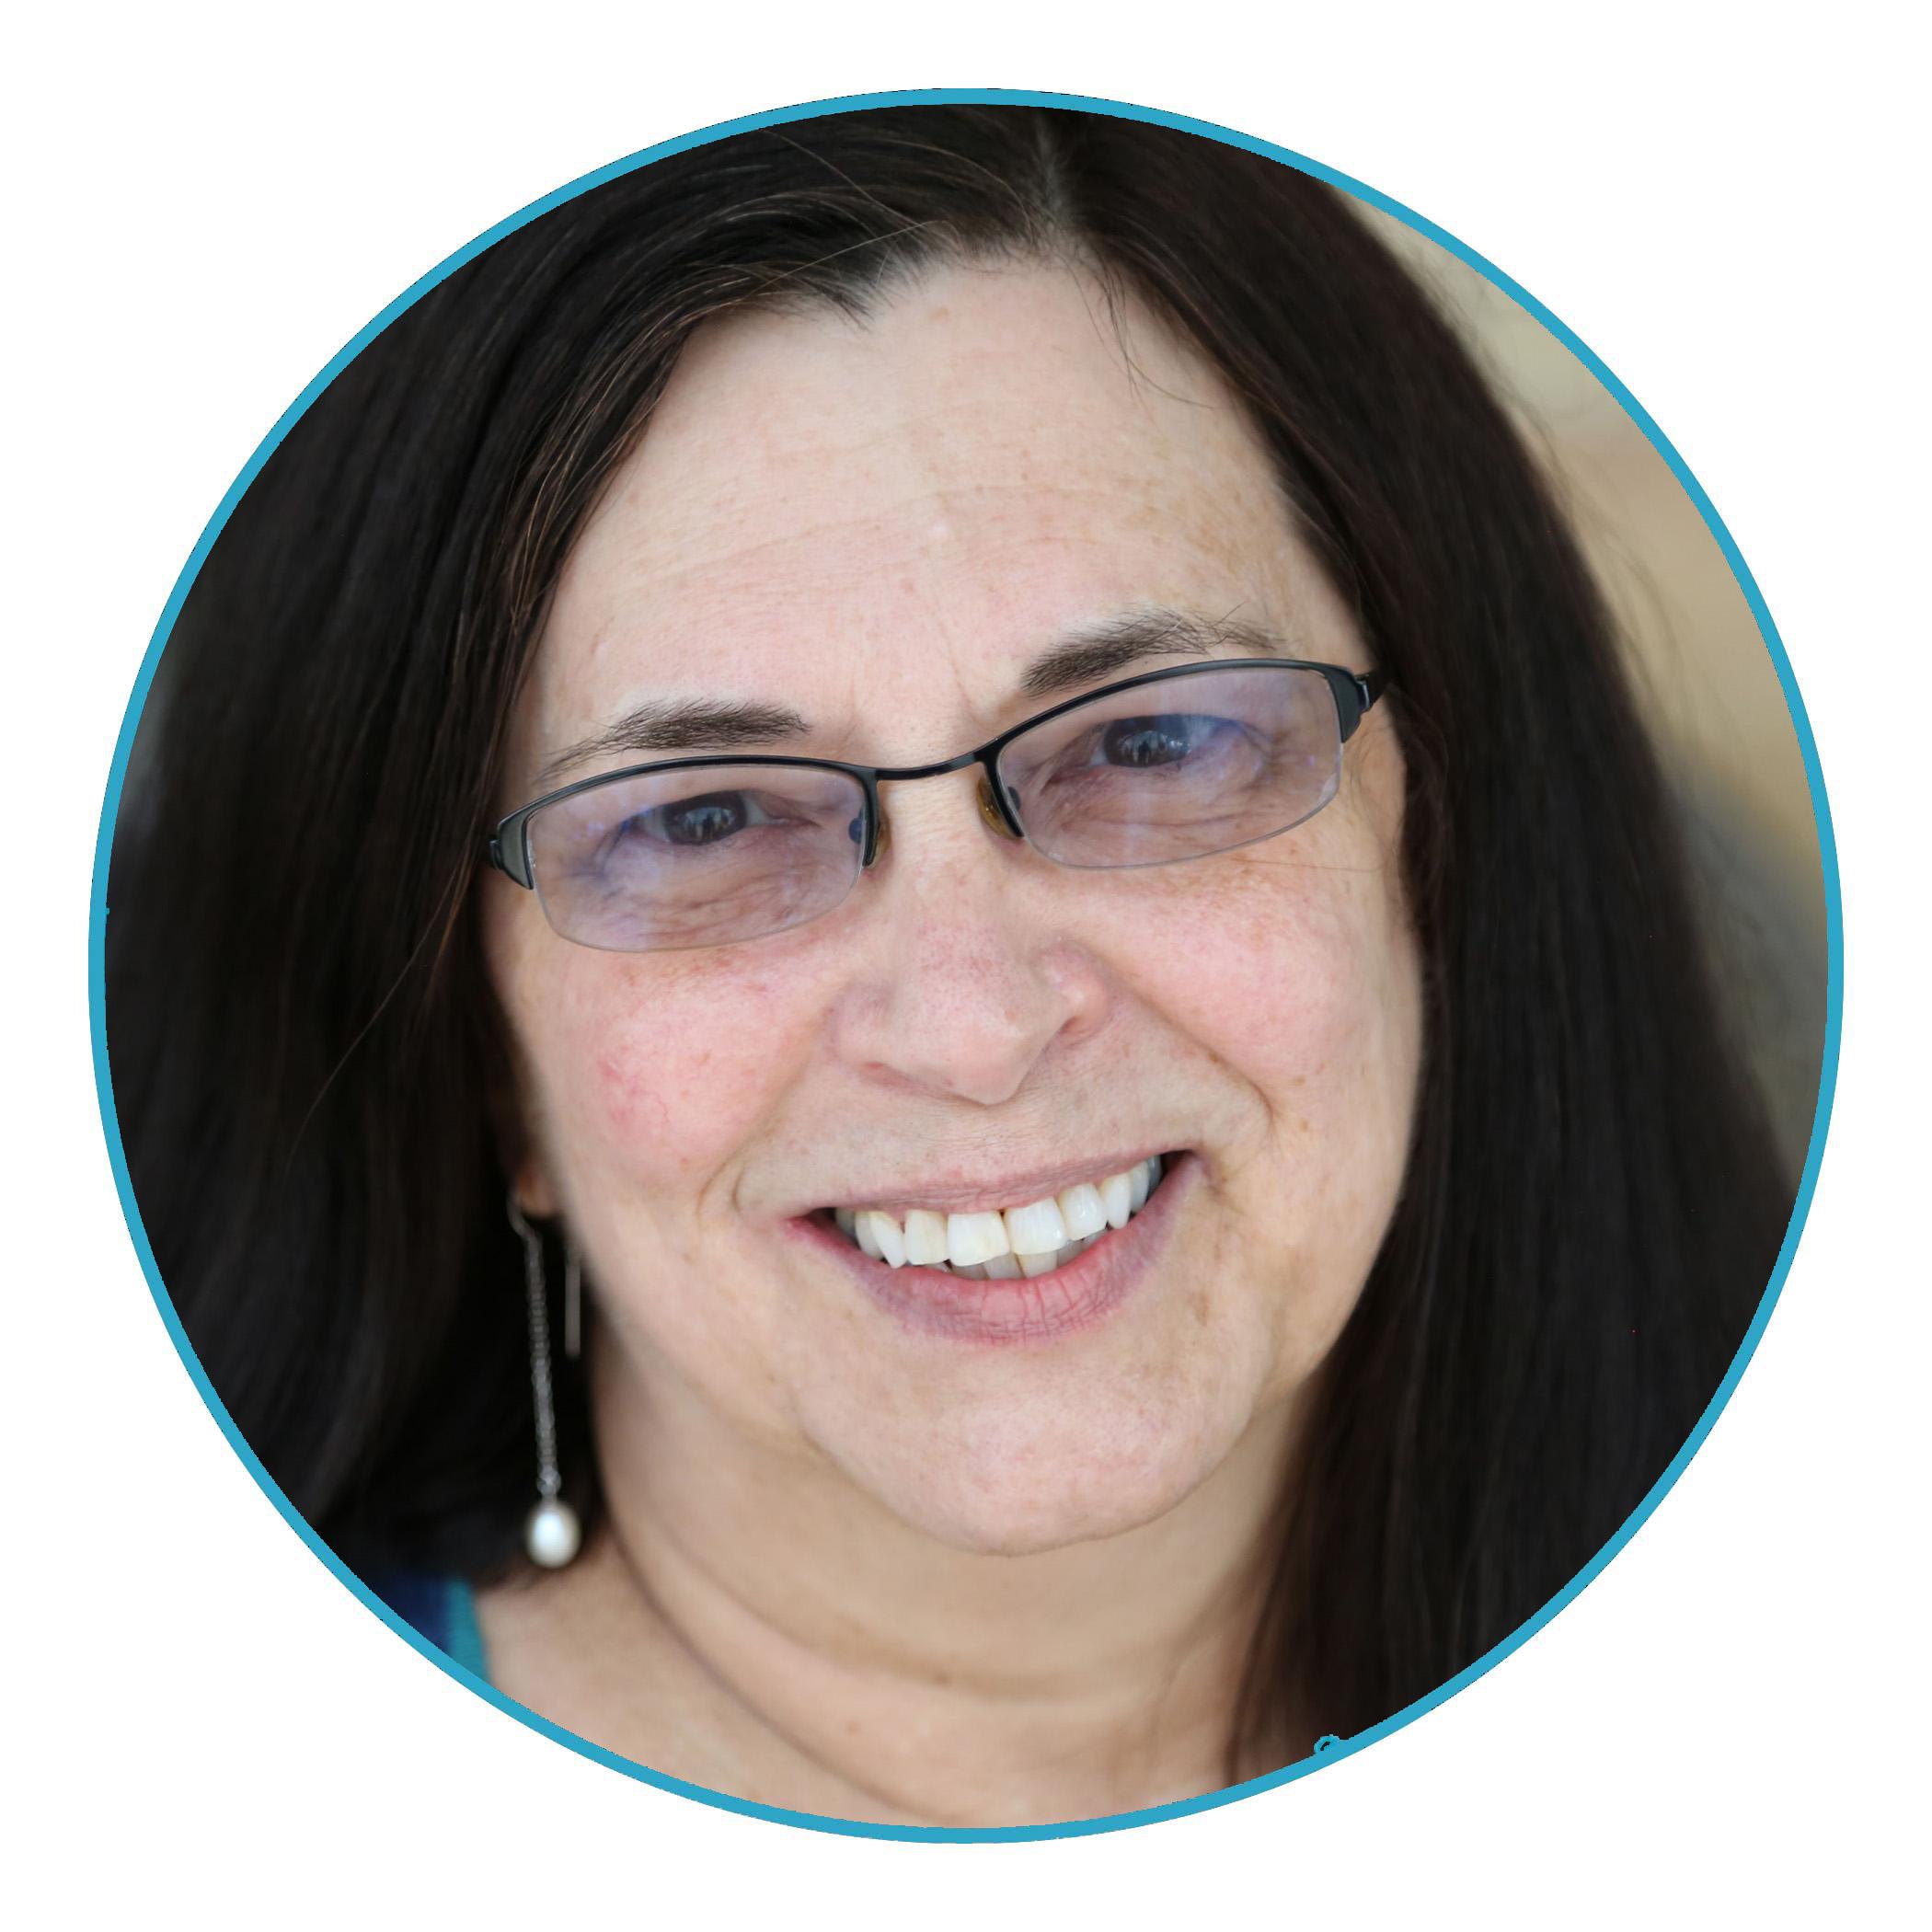 Mellenee Finger, Director of K-T Support Group and Meet The PROS Advisor